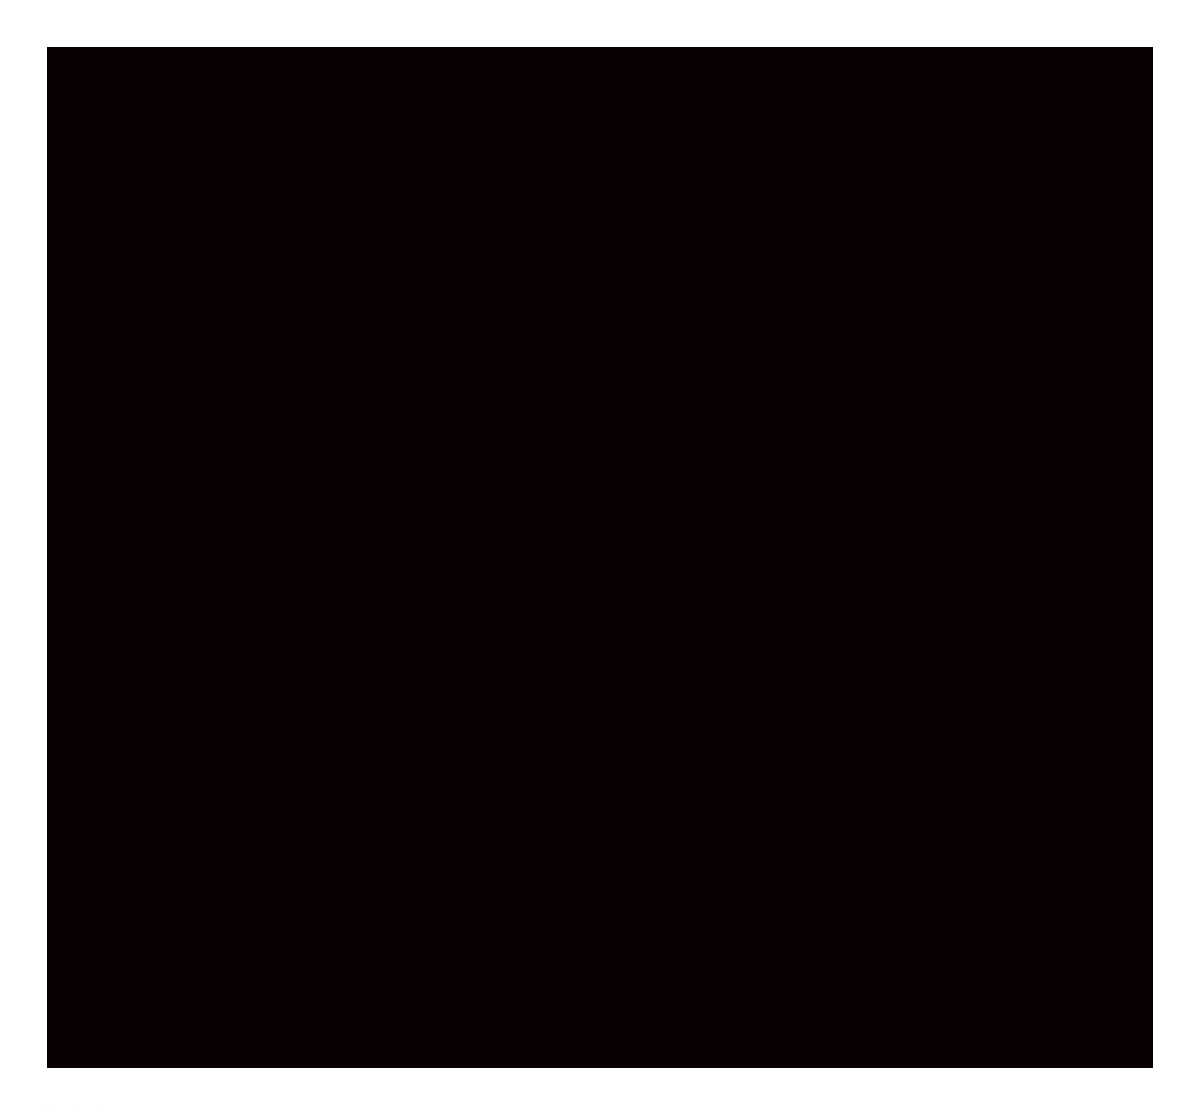 8421SR - Black